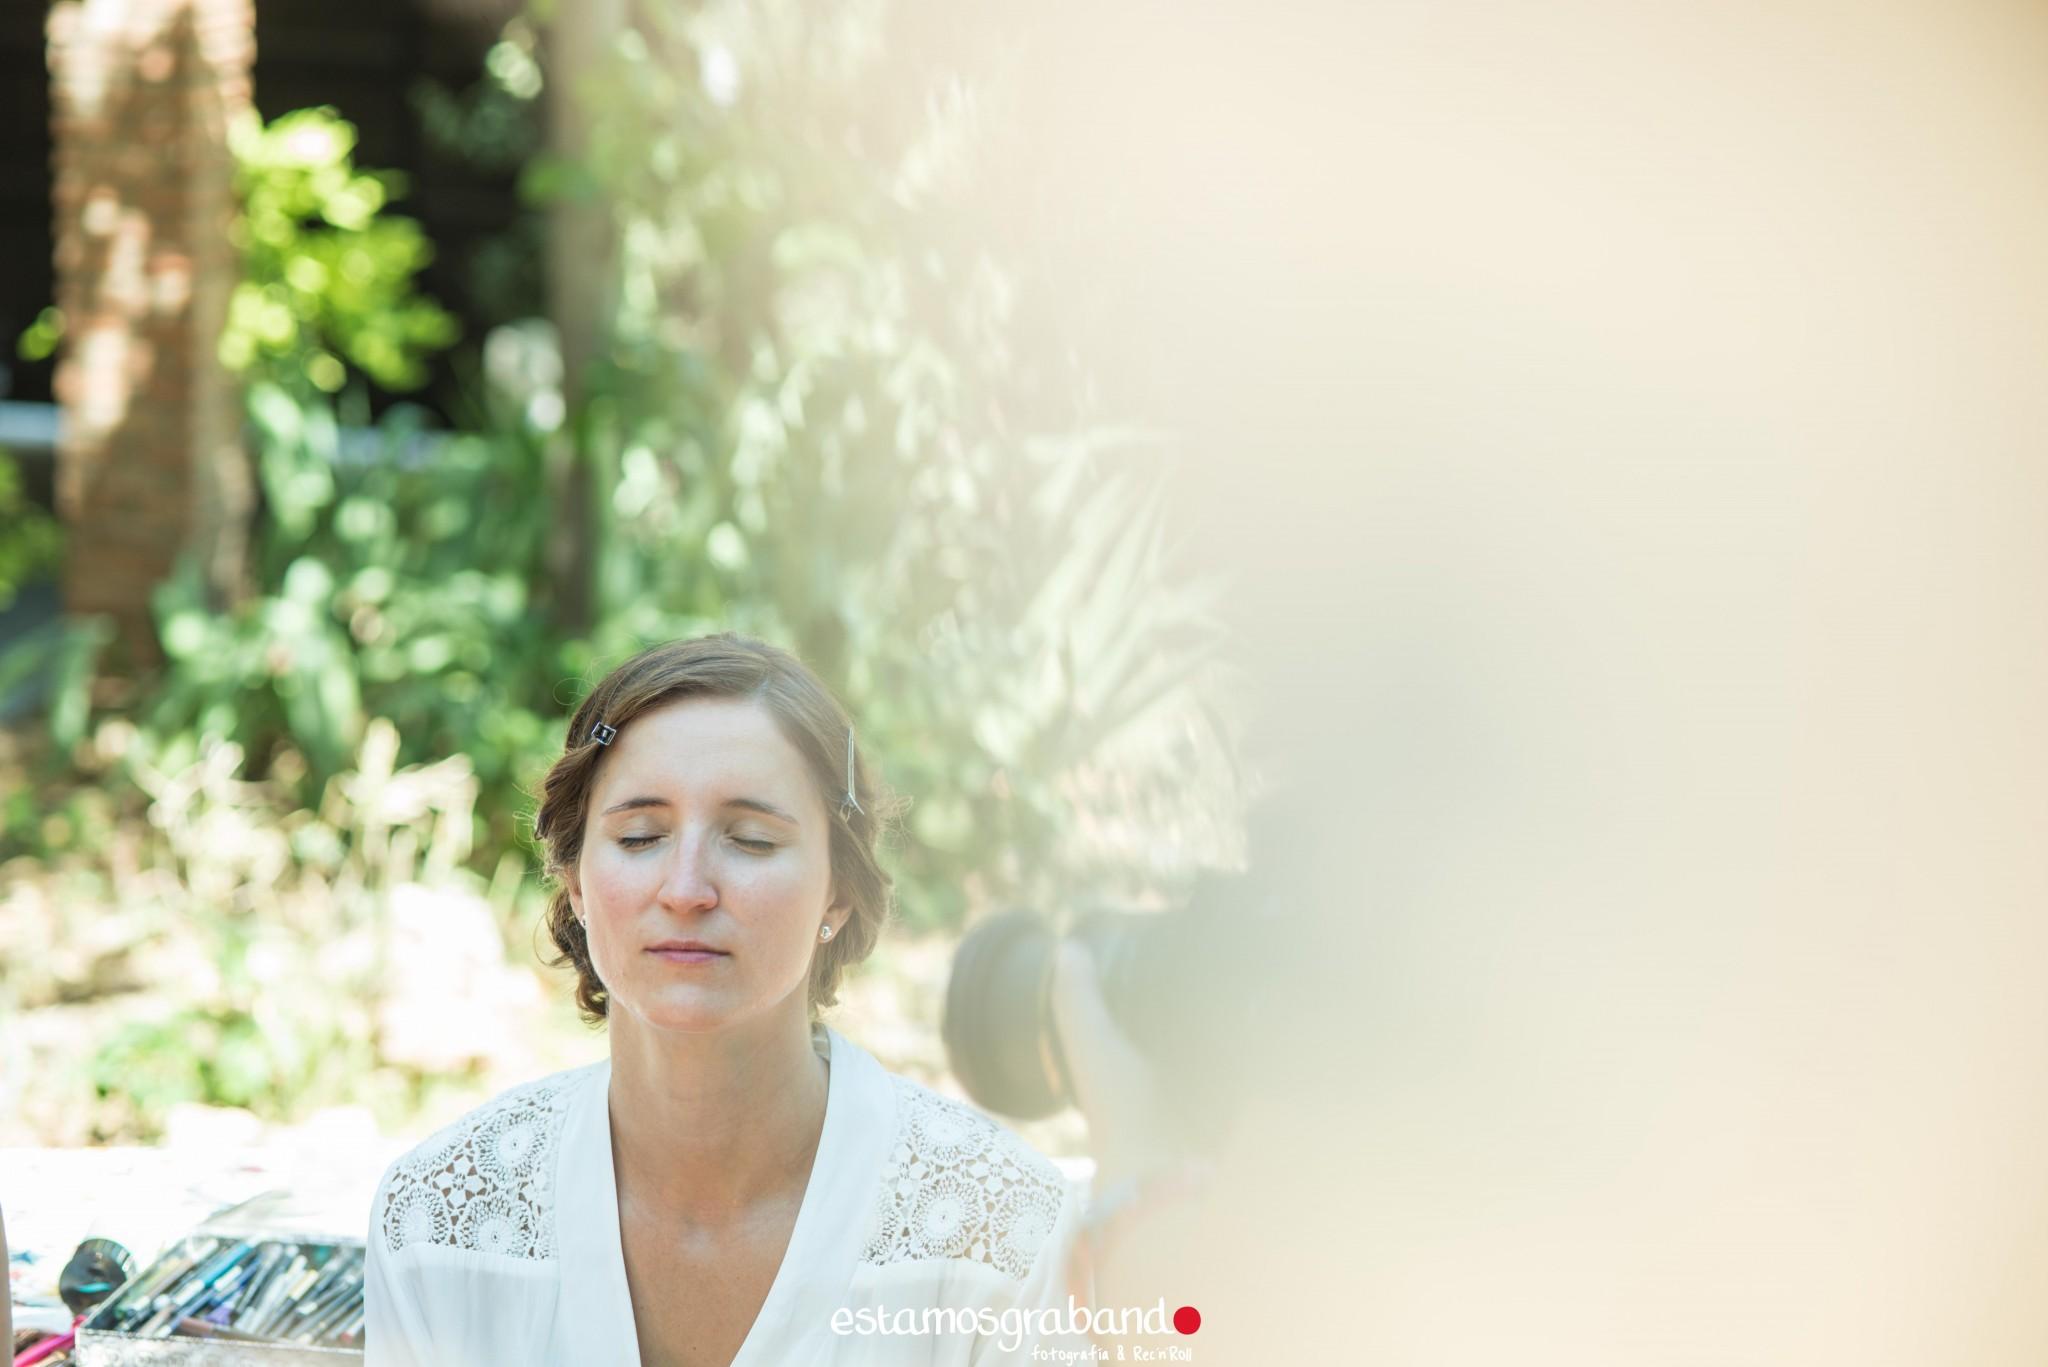 LEO-Y-PEDRO-15 Fotografía de Boda_Leo & Pedro [Jardines de la Mamunia, Granada] - video boda cadiz